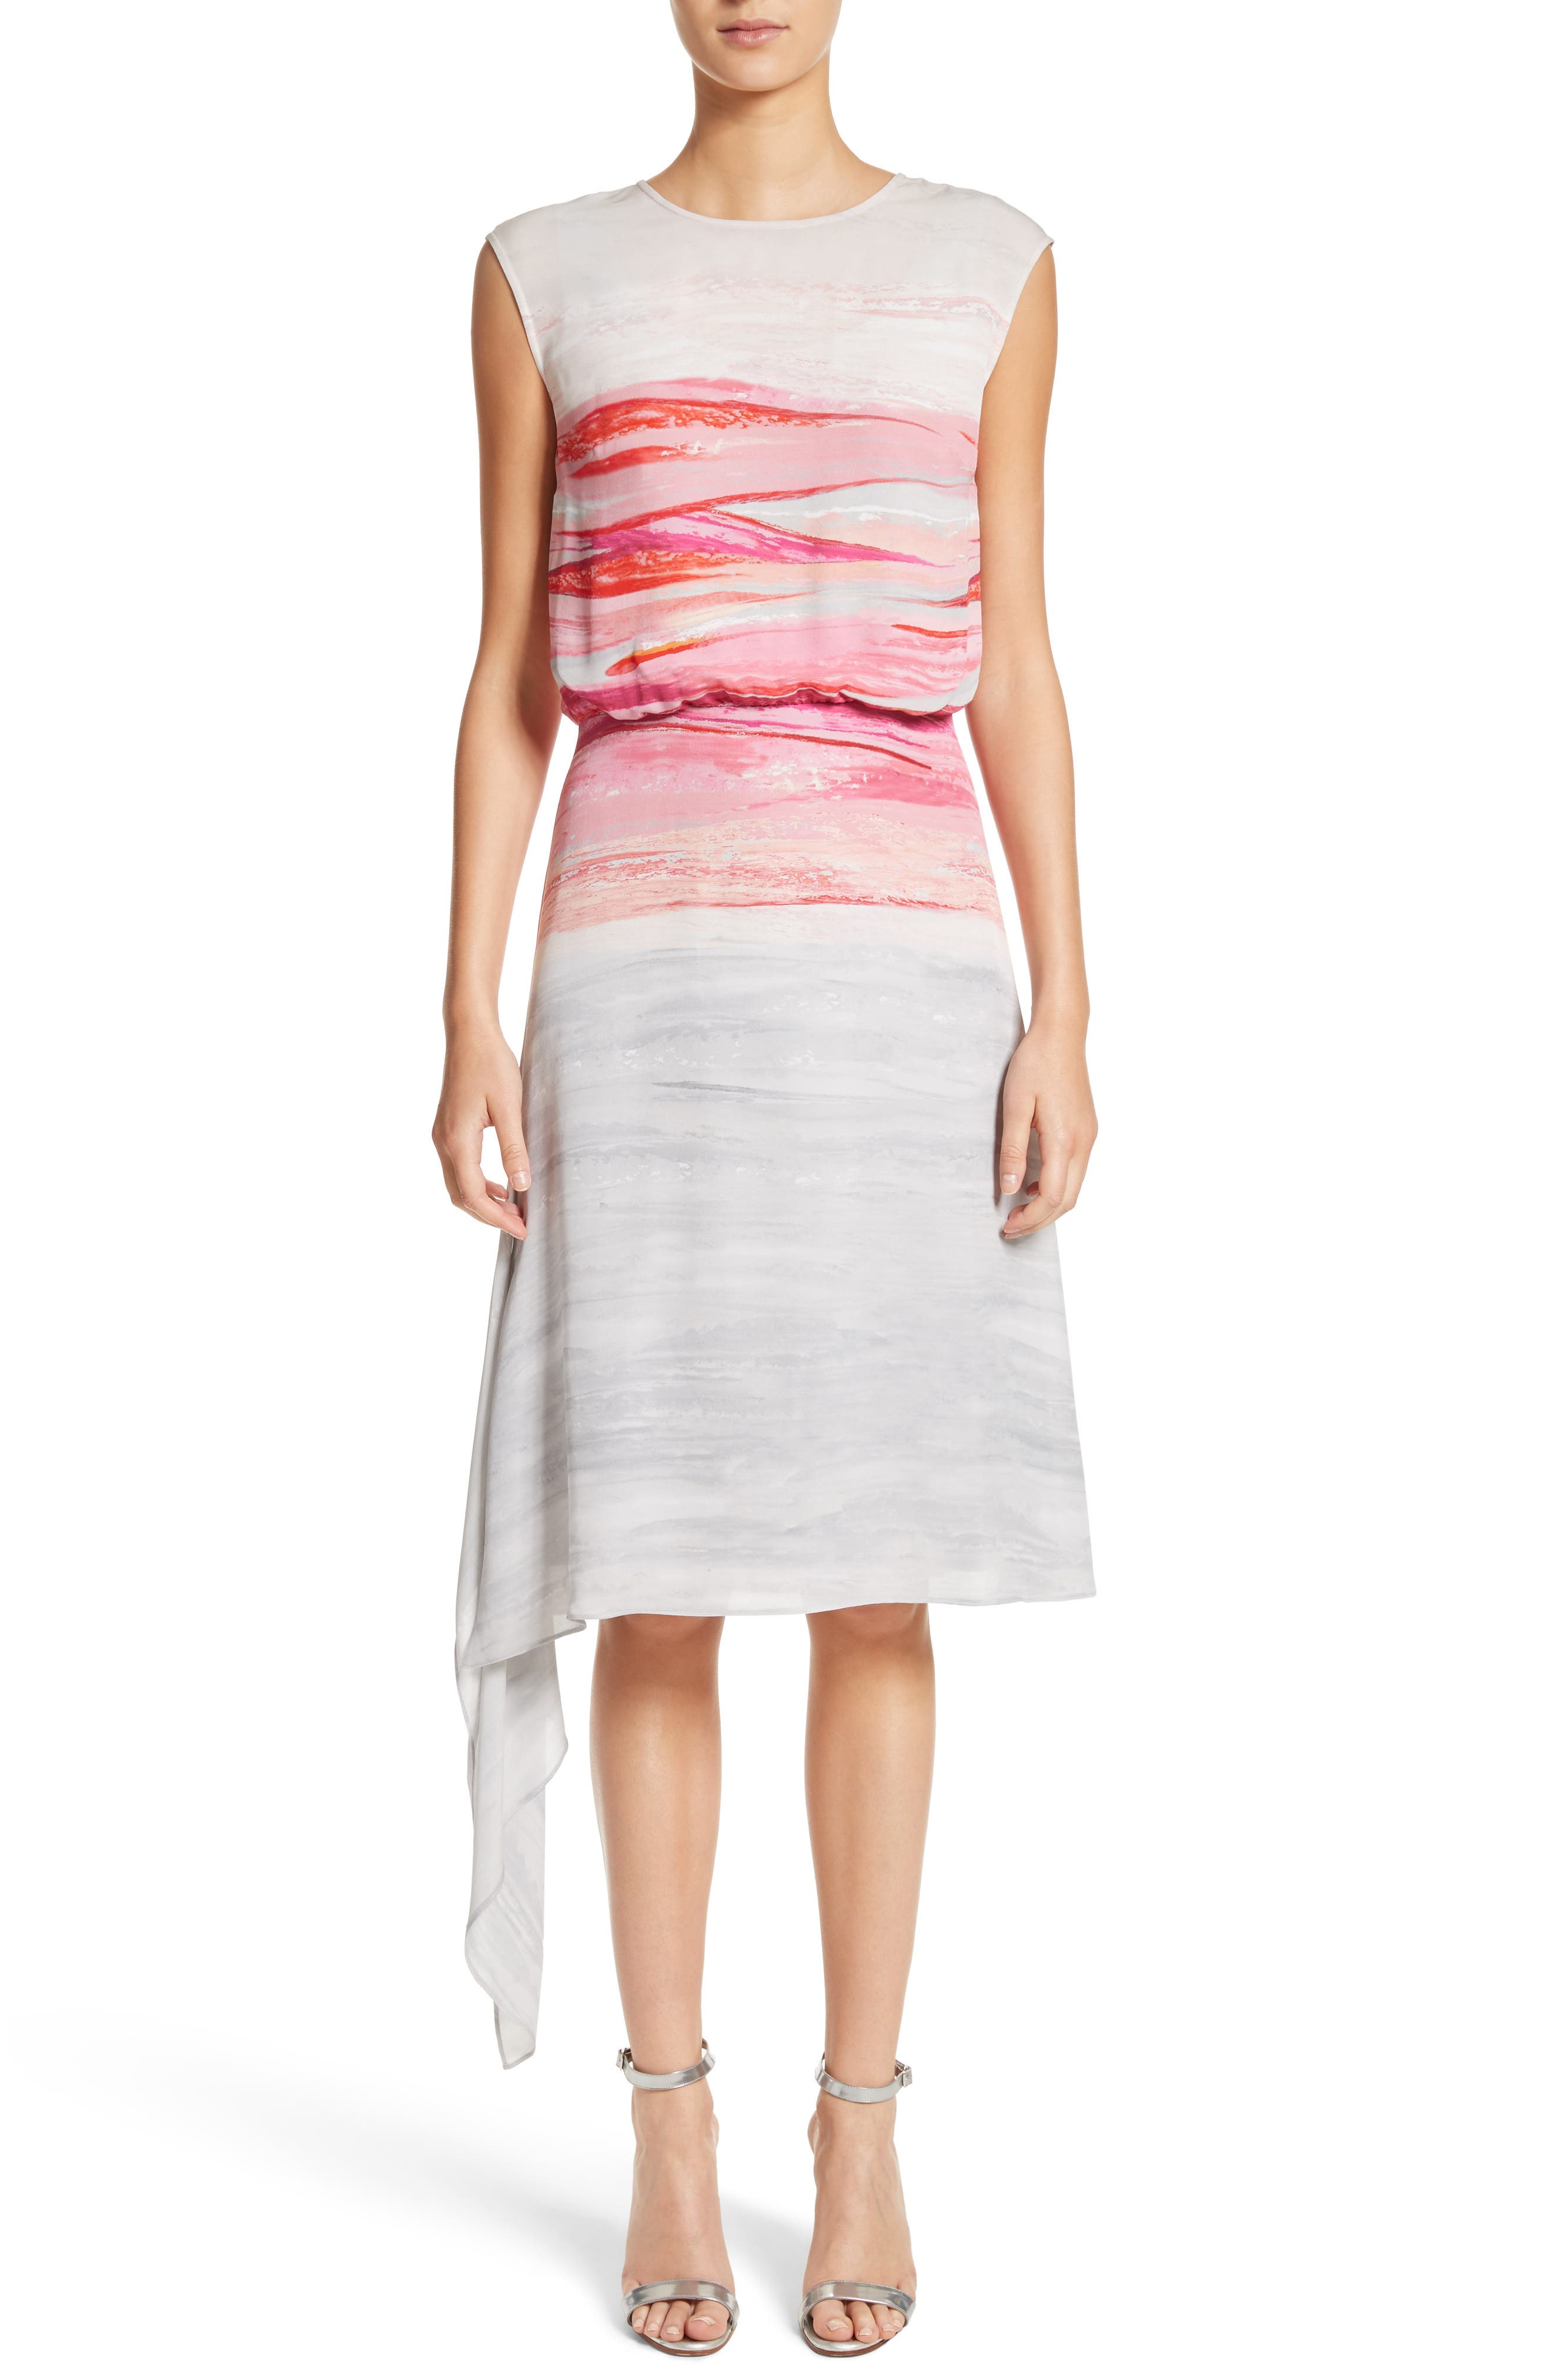 Main Image - St. John Collection Textured Brushstroke Print Silk Satin Dress